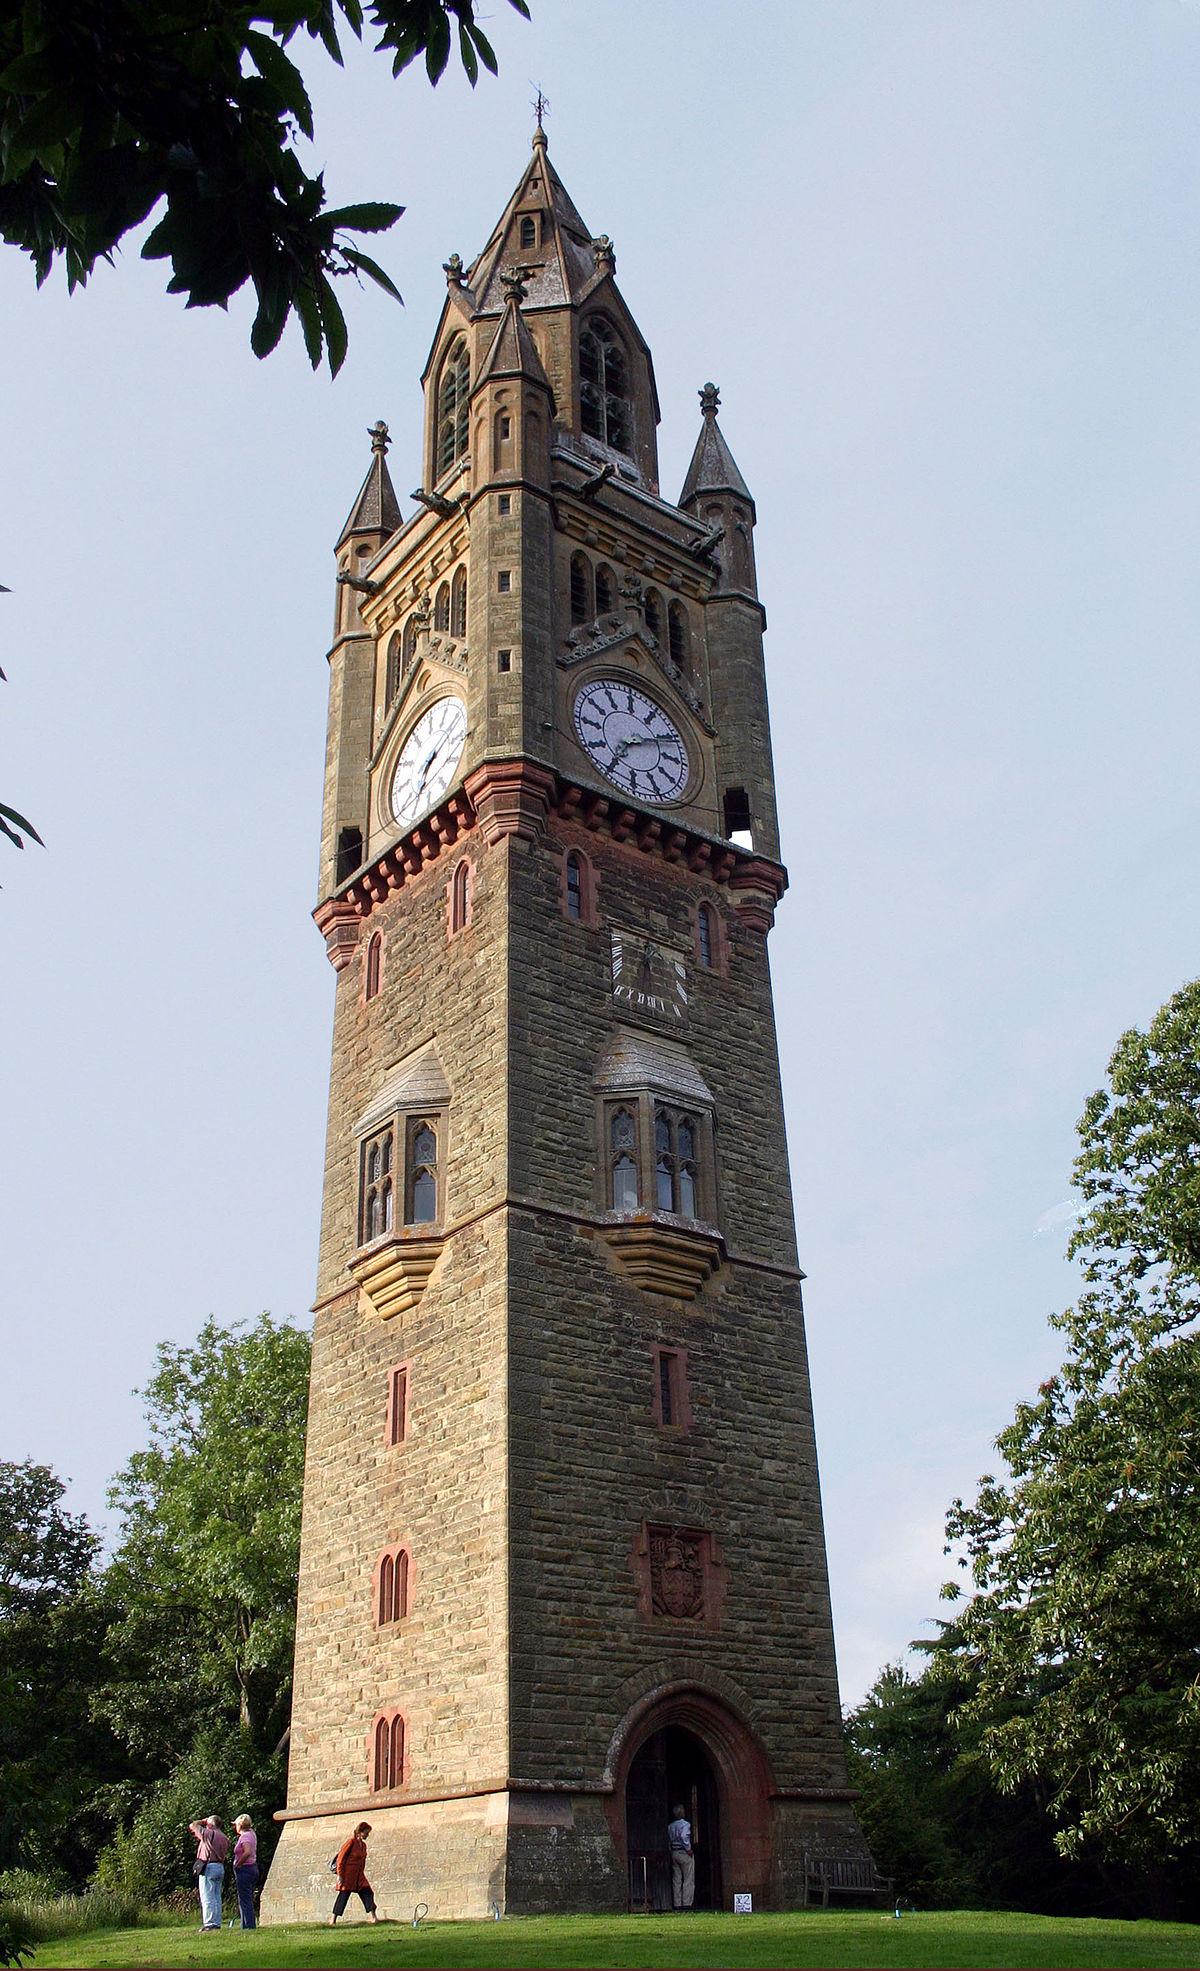 Abberley Clock Tower - Wikipedia